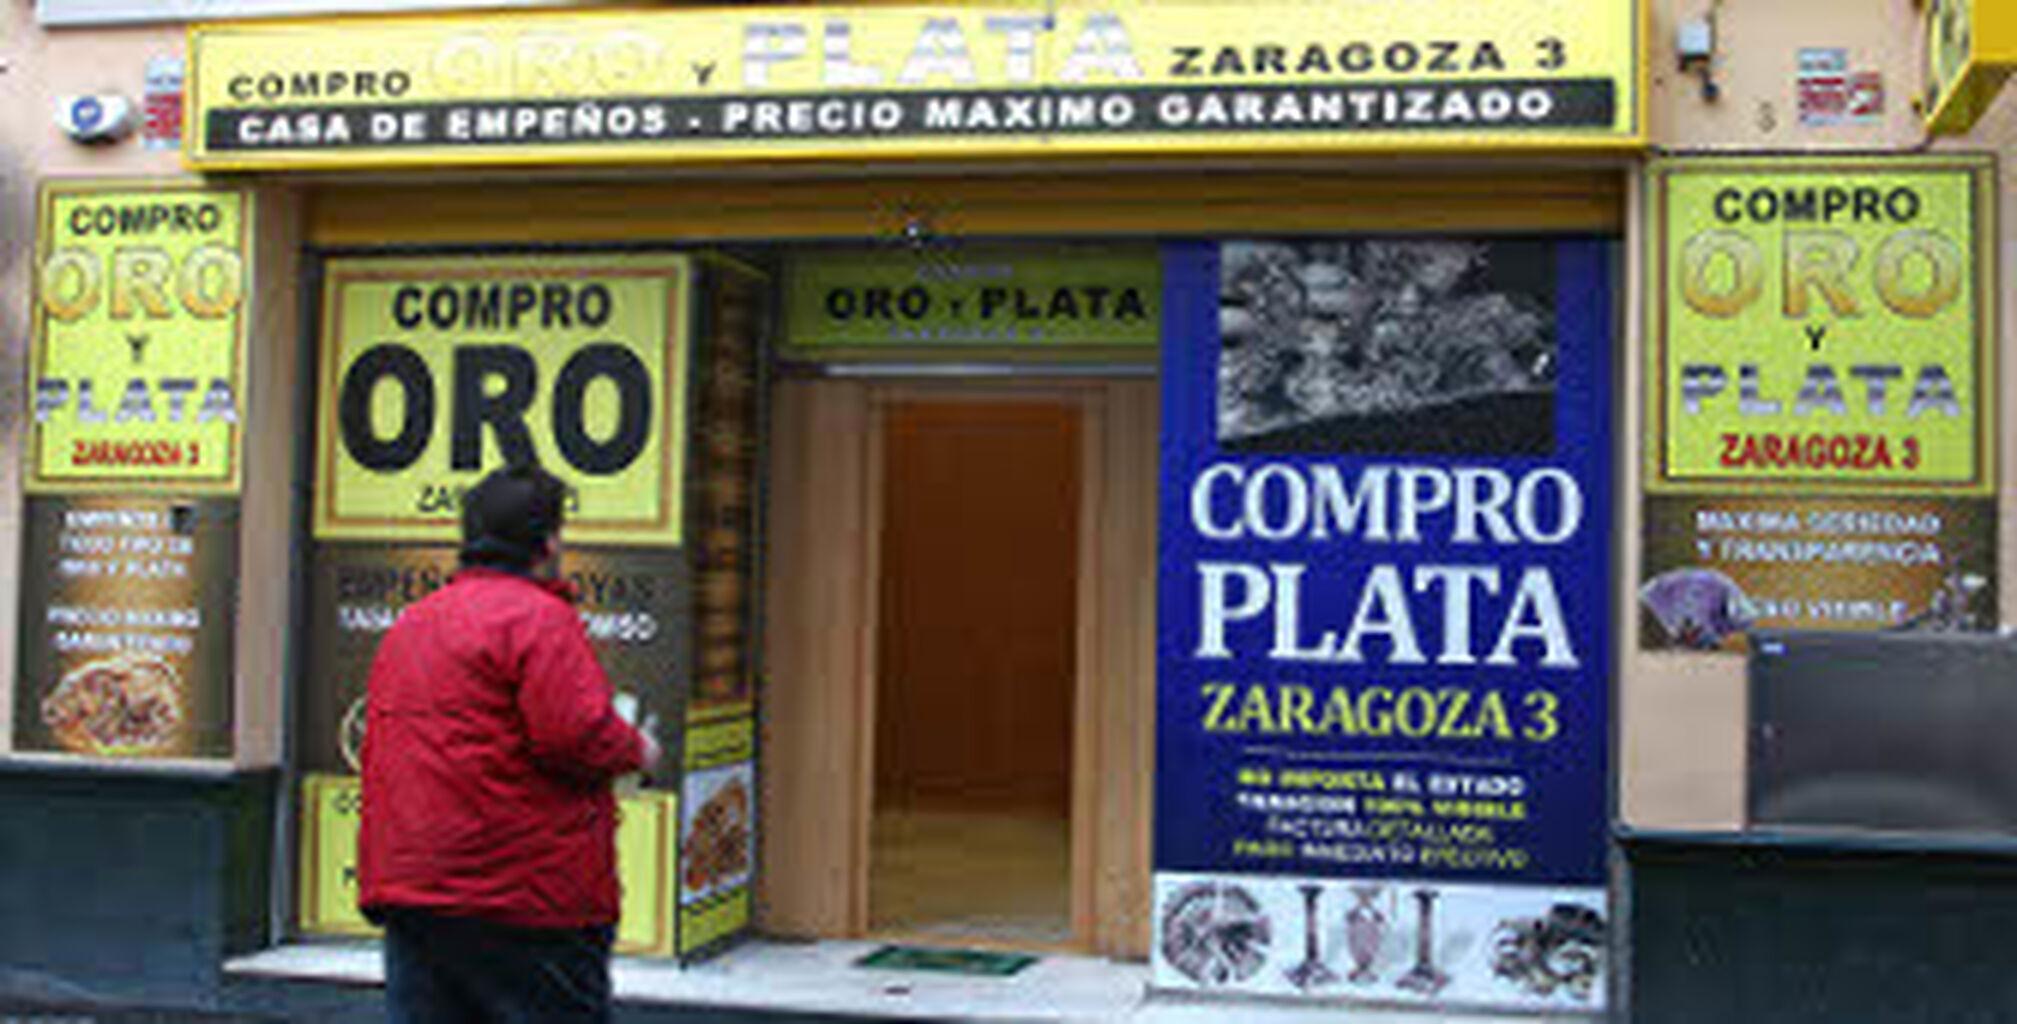 05a8aa935efa Sevilla - Roba joyas y 15.000 euros diciendo ser policía en un Compro Oro -  Diario de Sevilla